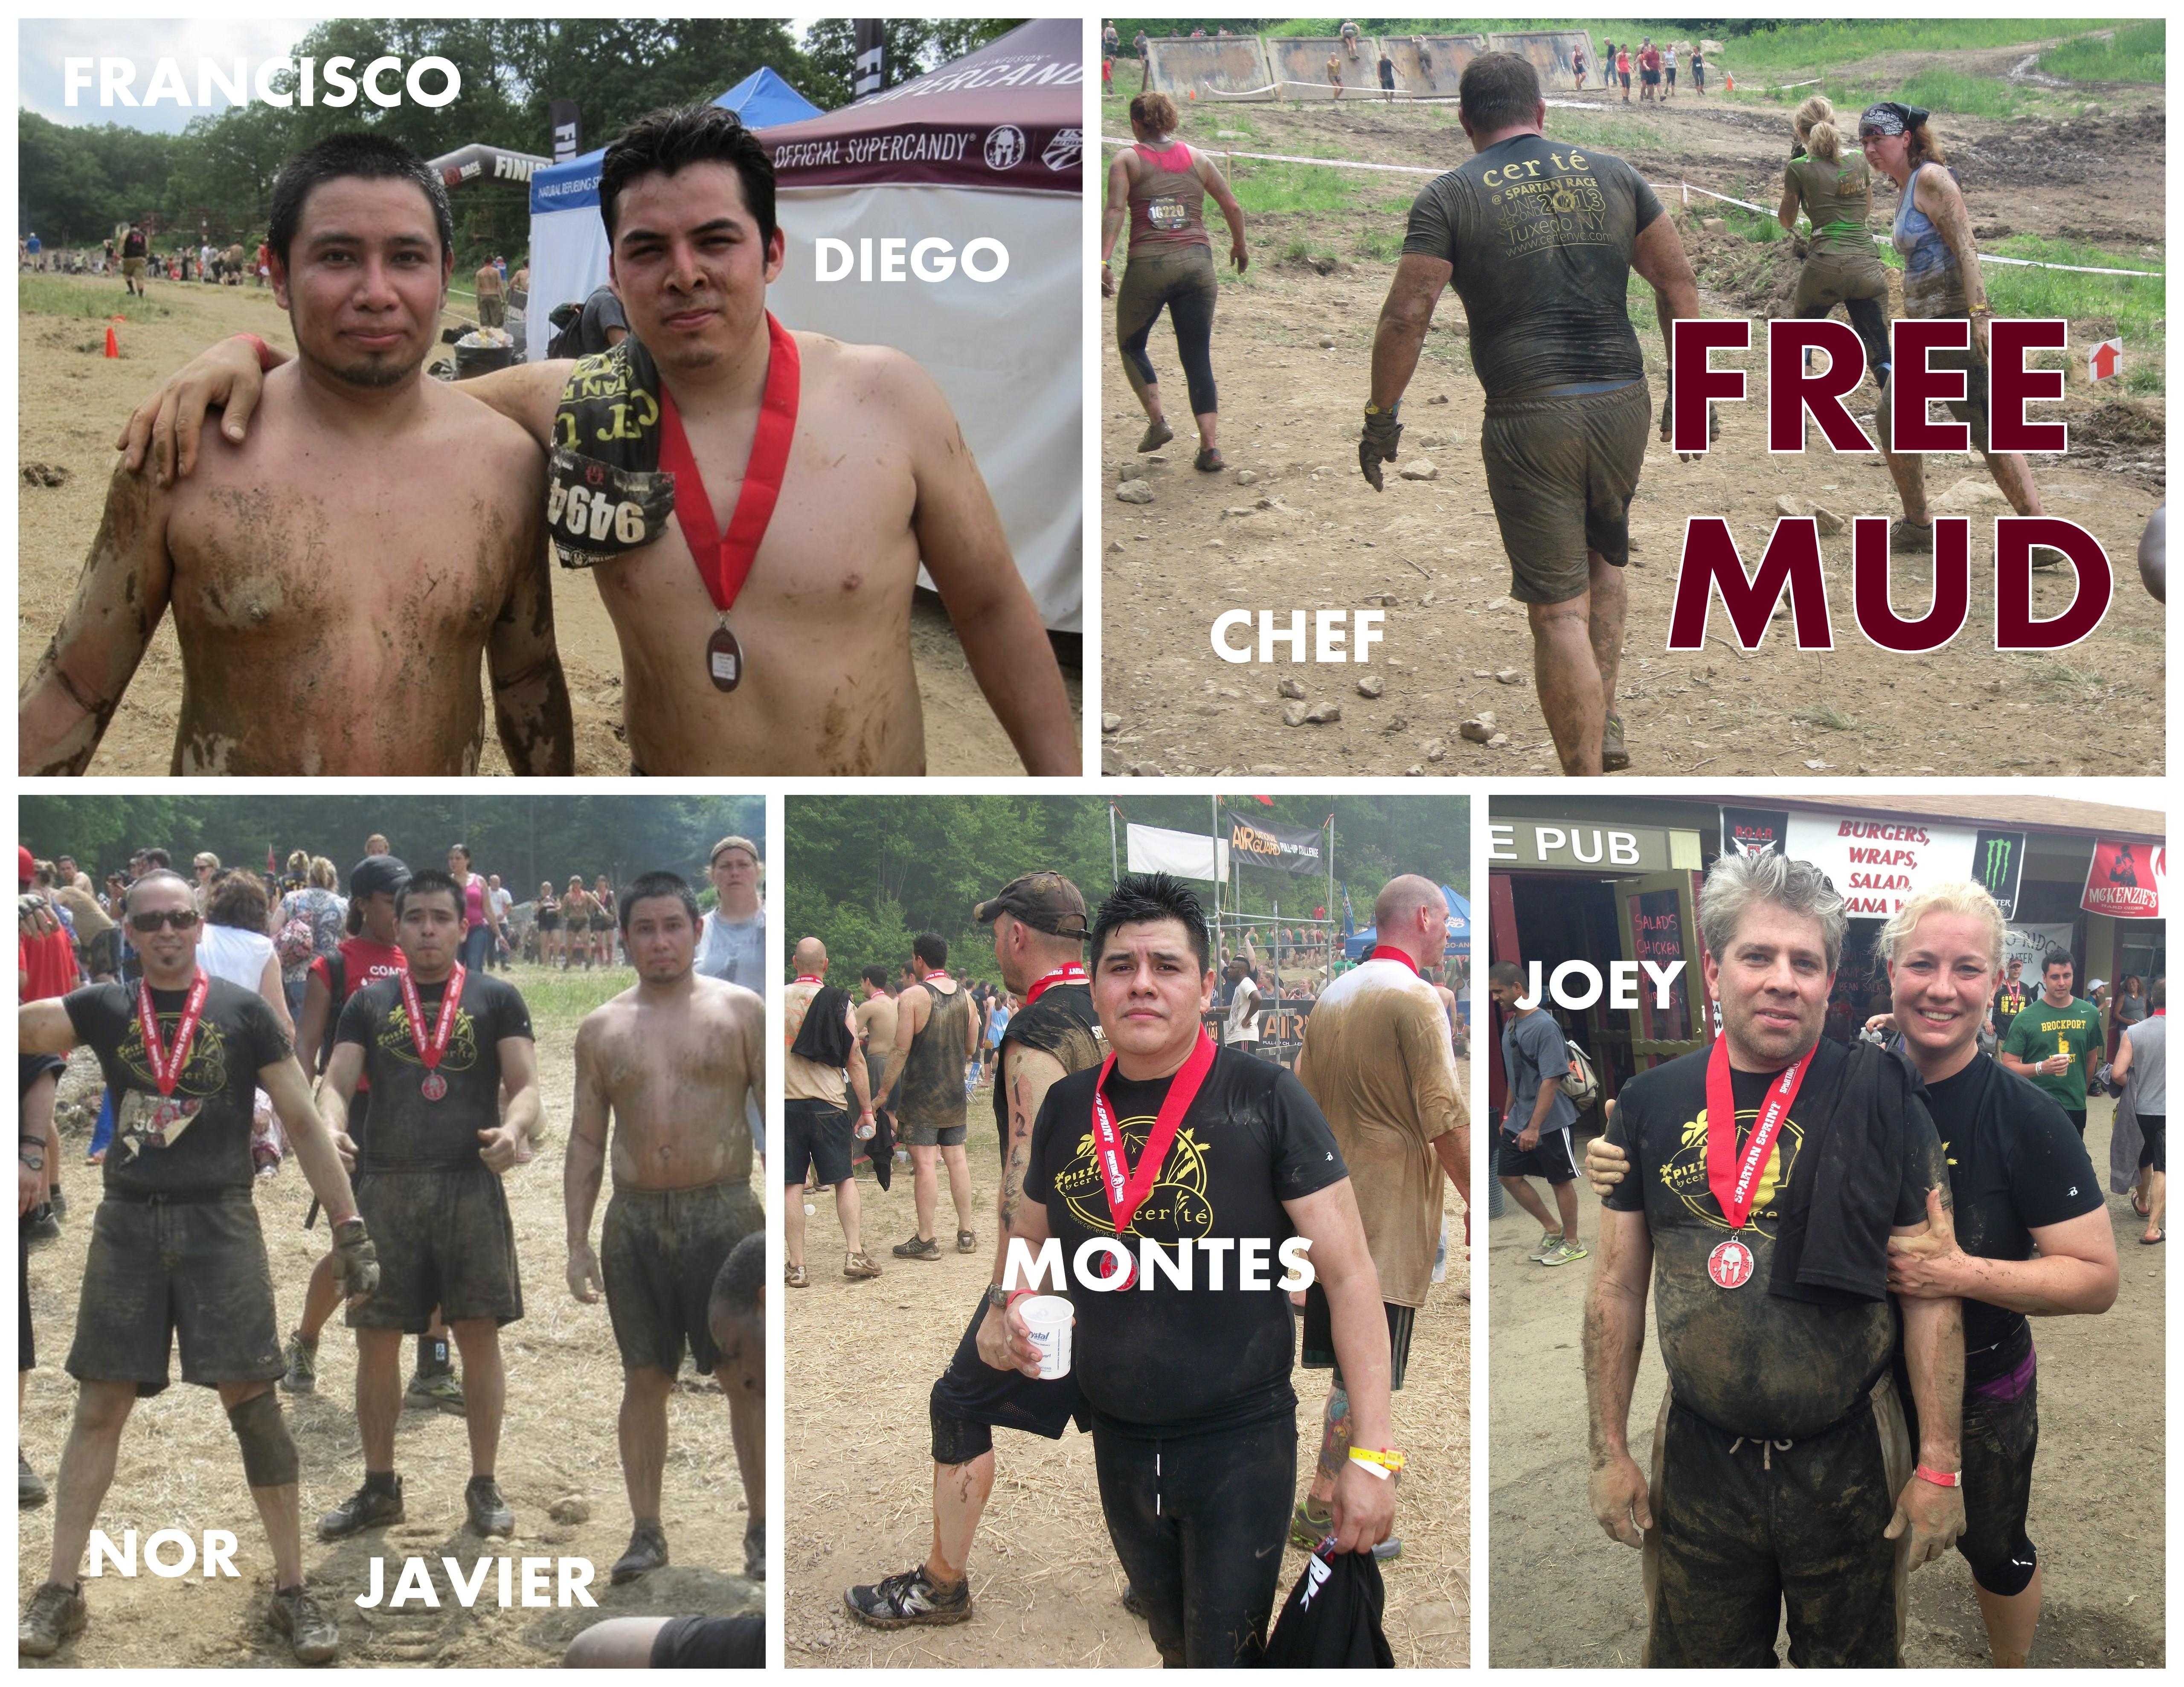 Spartan Race 2013. Collage. FREE MUD